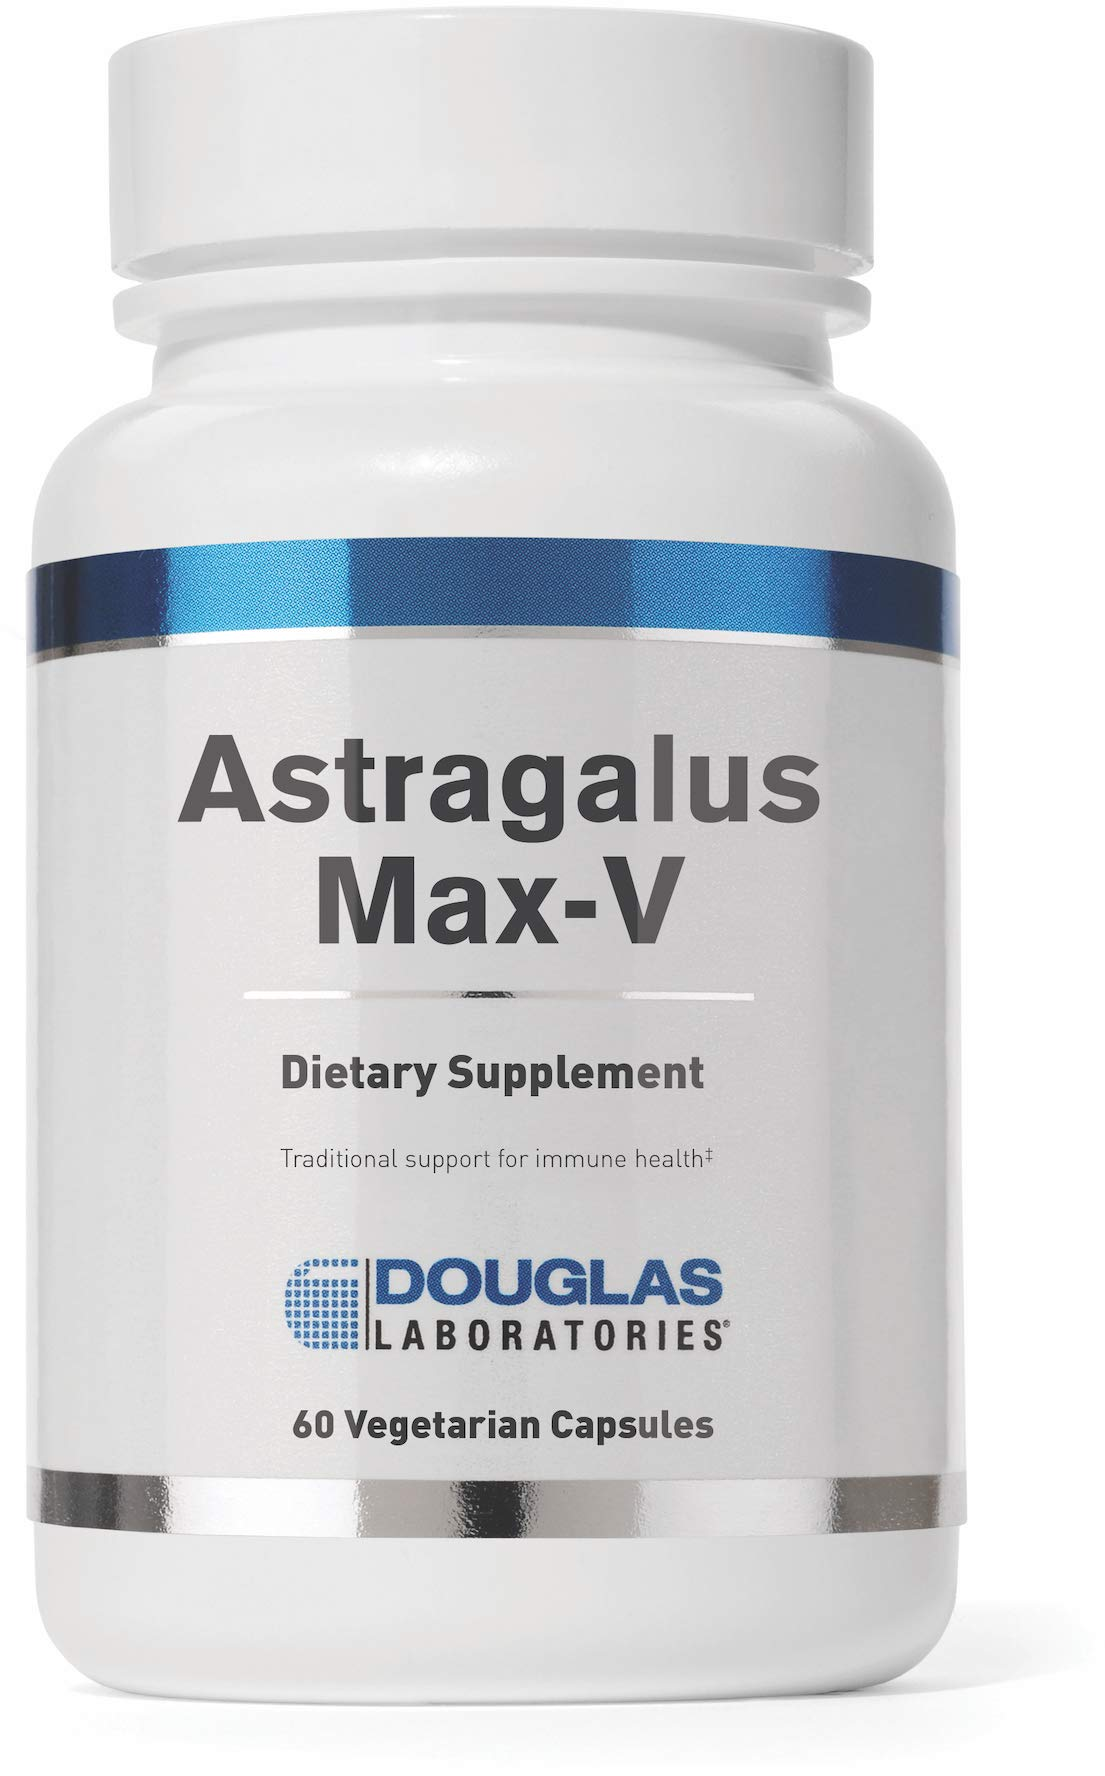 Douglas Laboratories - Astragalus Max-V - Standardized Astragalus to Provide Immune Support* - 60 Capsules